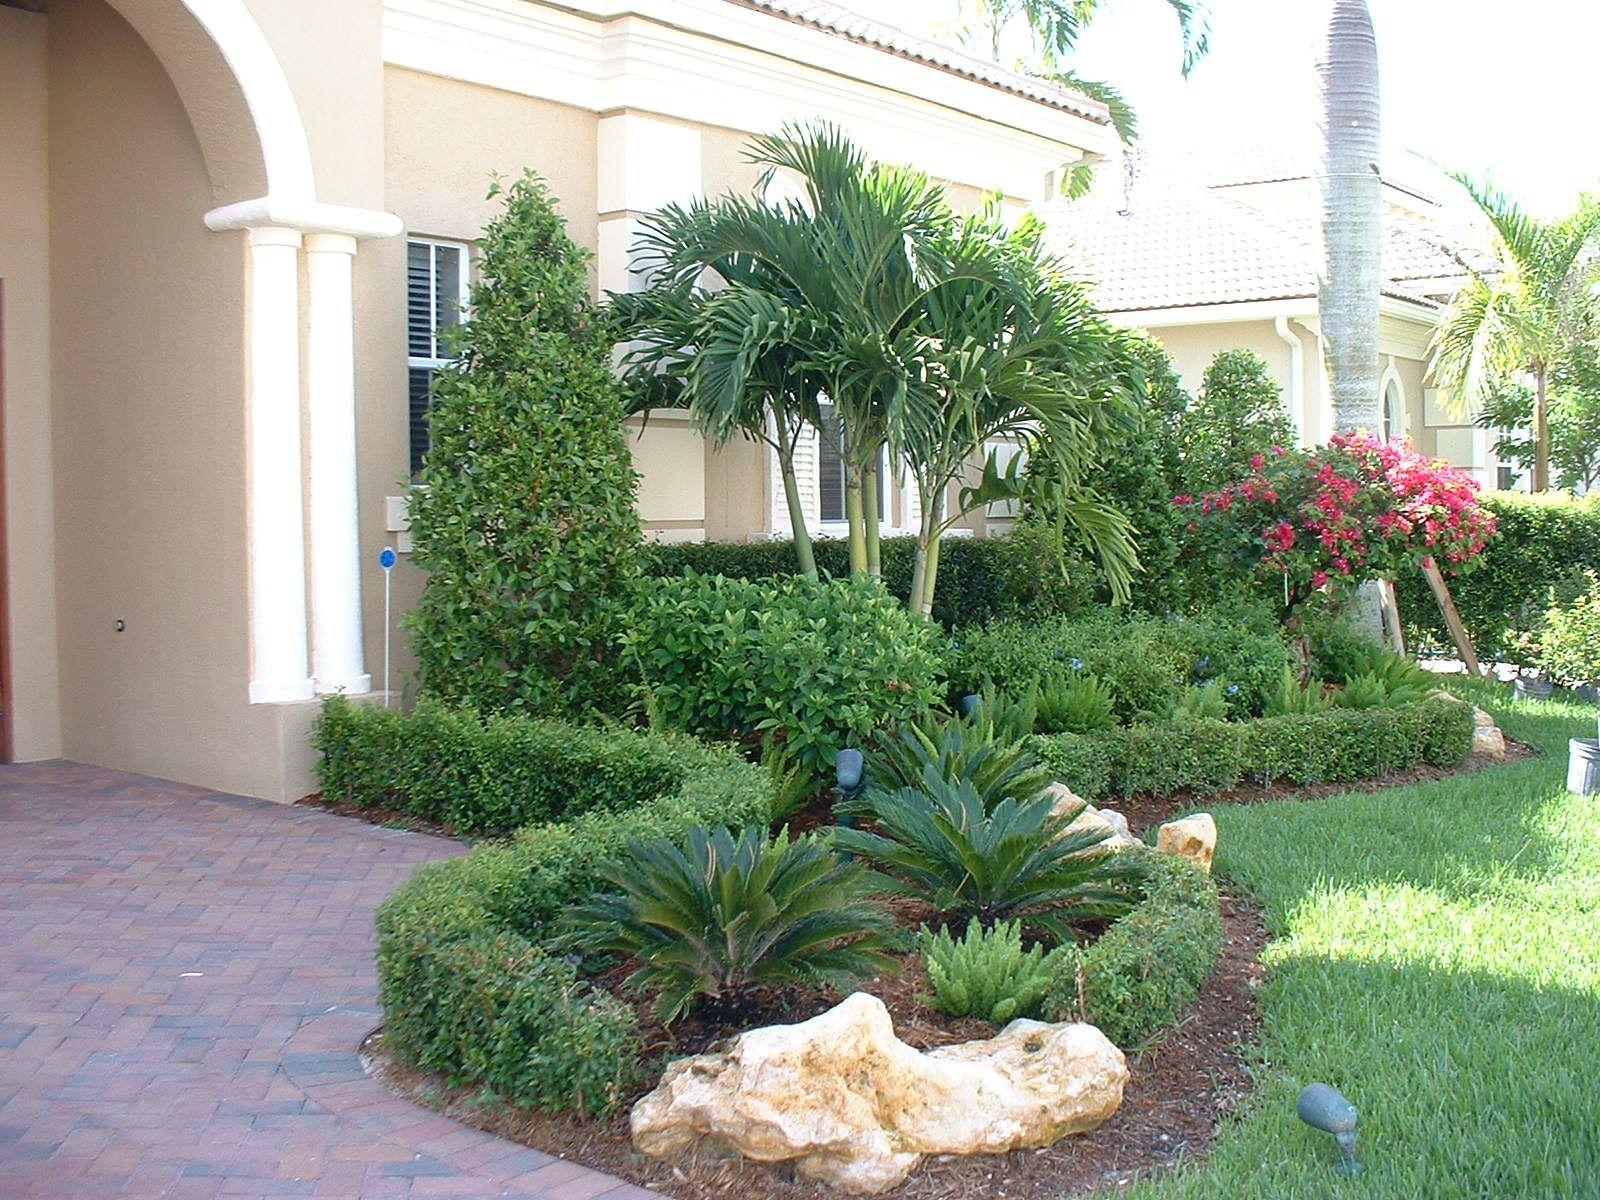 Florida Homes Landscape 50 Best Florida Luxury Houses Page 5 Of 100 Florida Luxury Wa Florida Landscaping Backyard Garden Landscape Backyard Garden Design